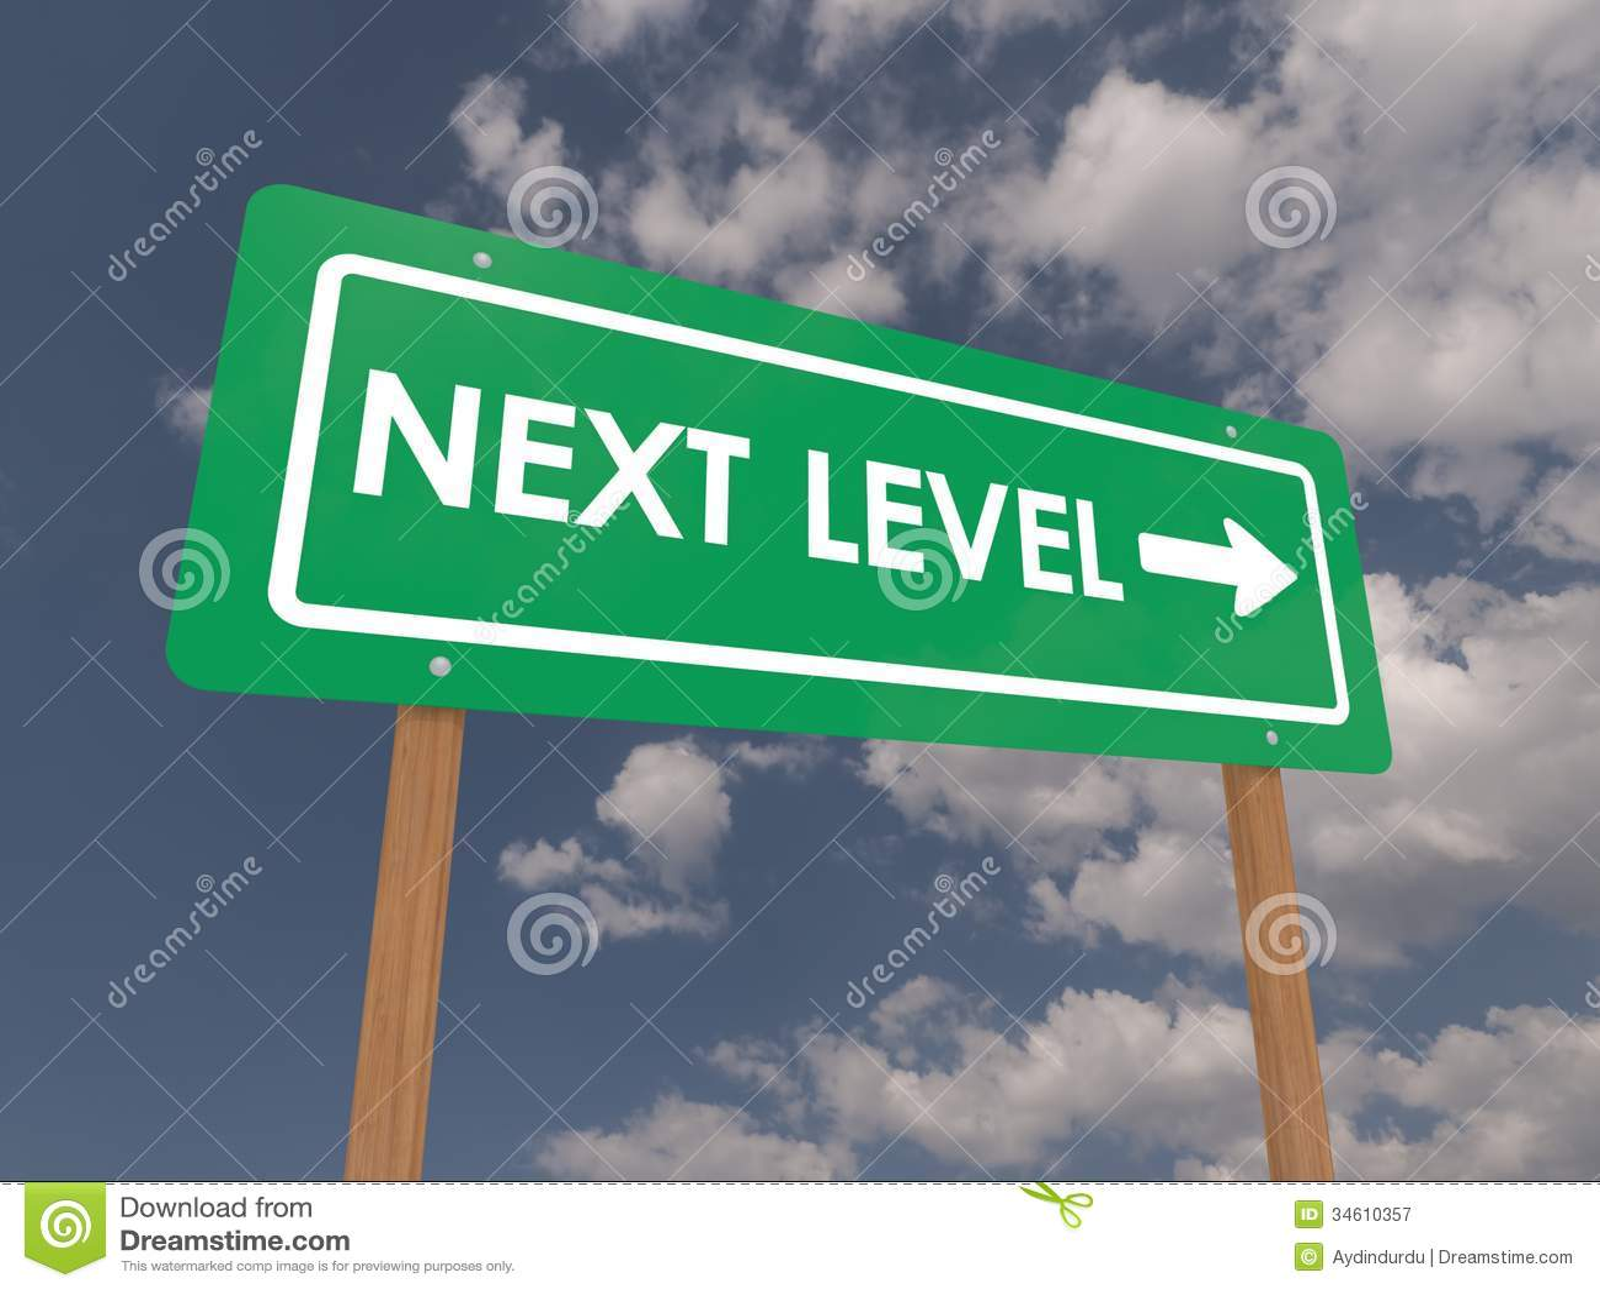 Next level business planning